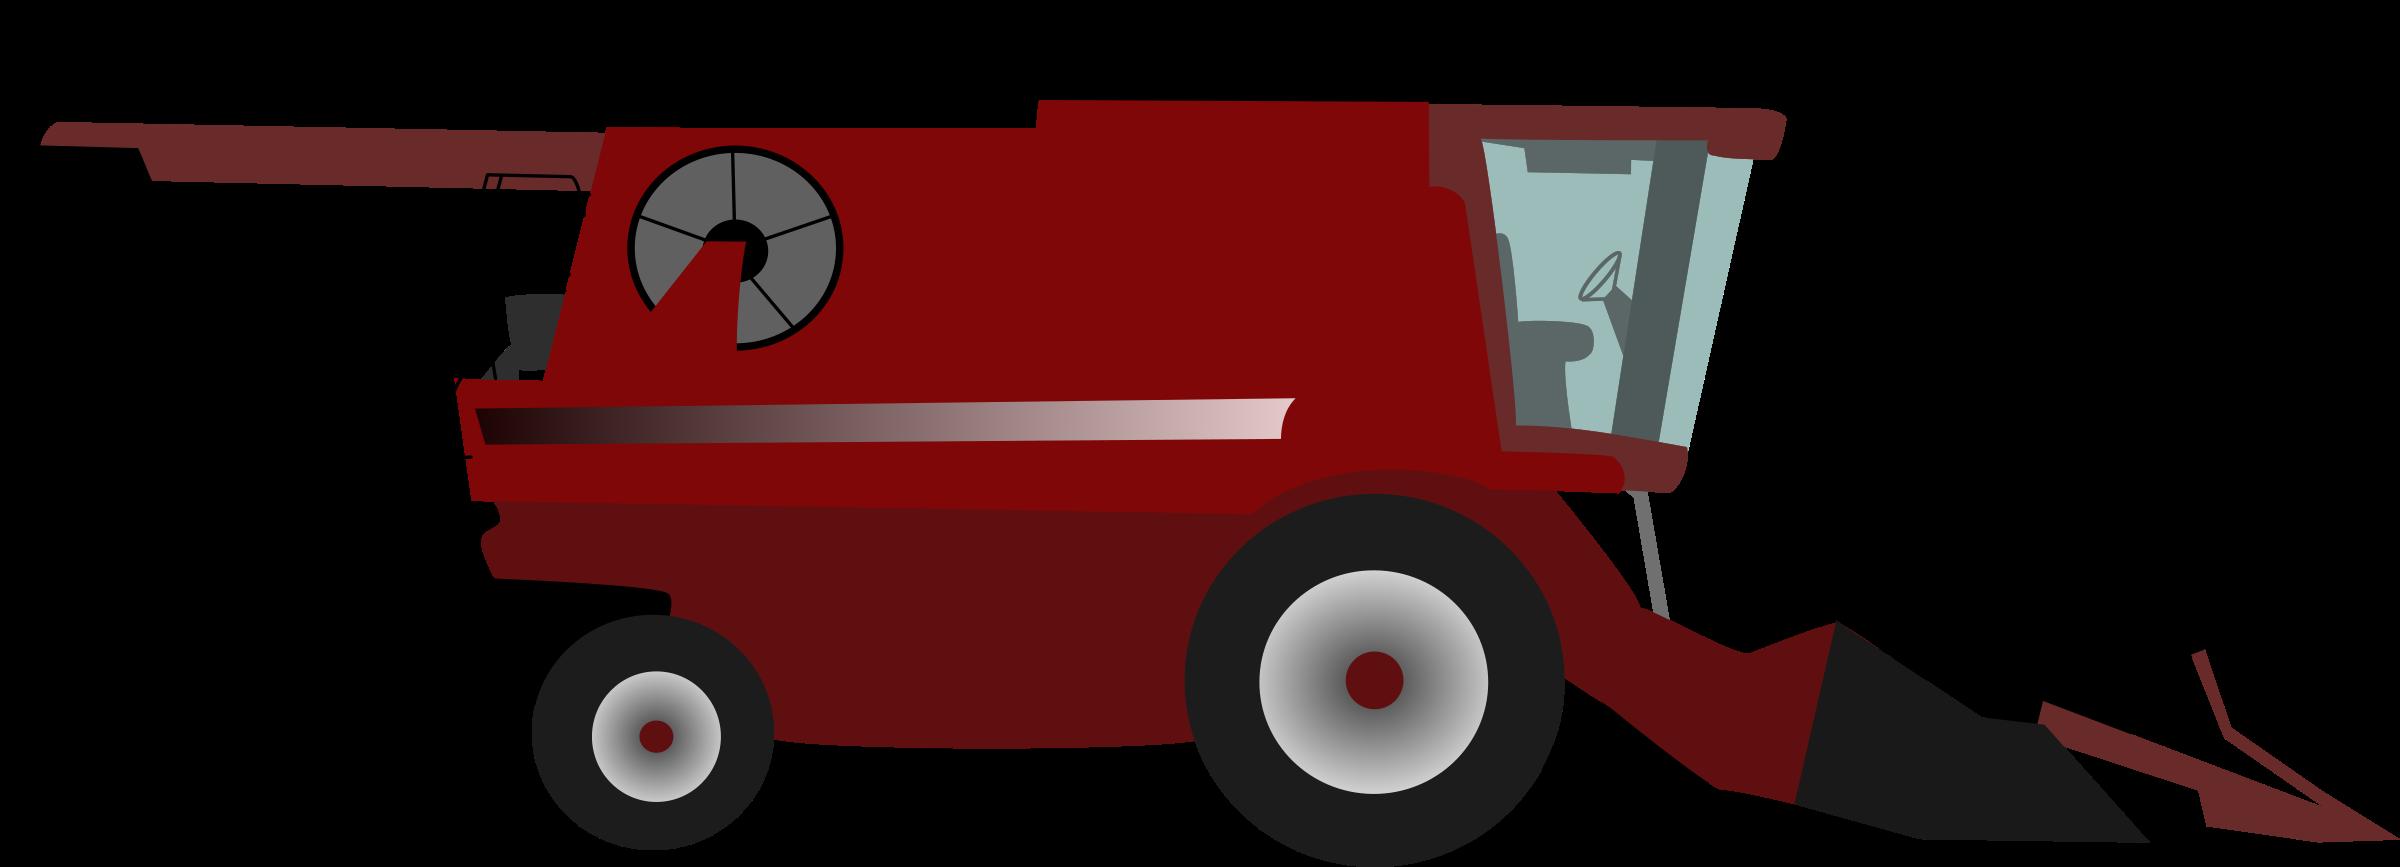 Farm Equipment Clip Art : Clipart combine harvester